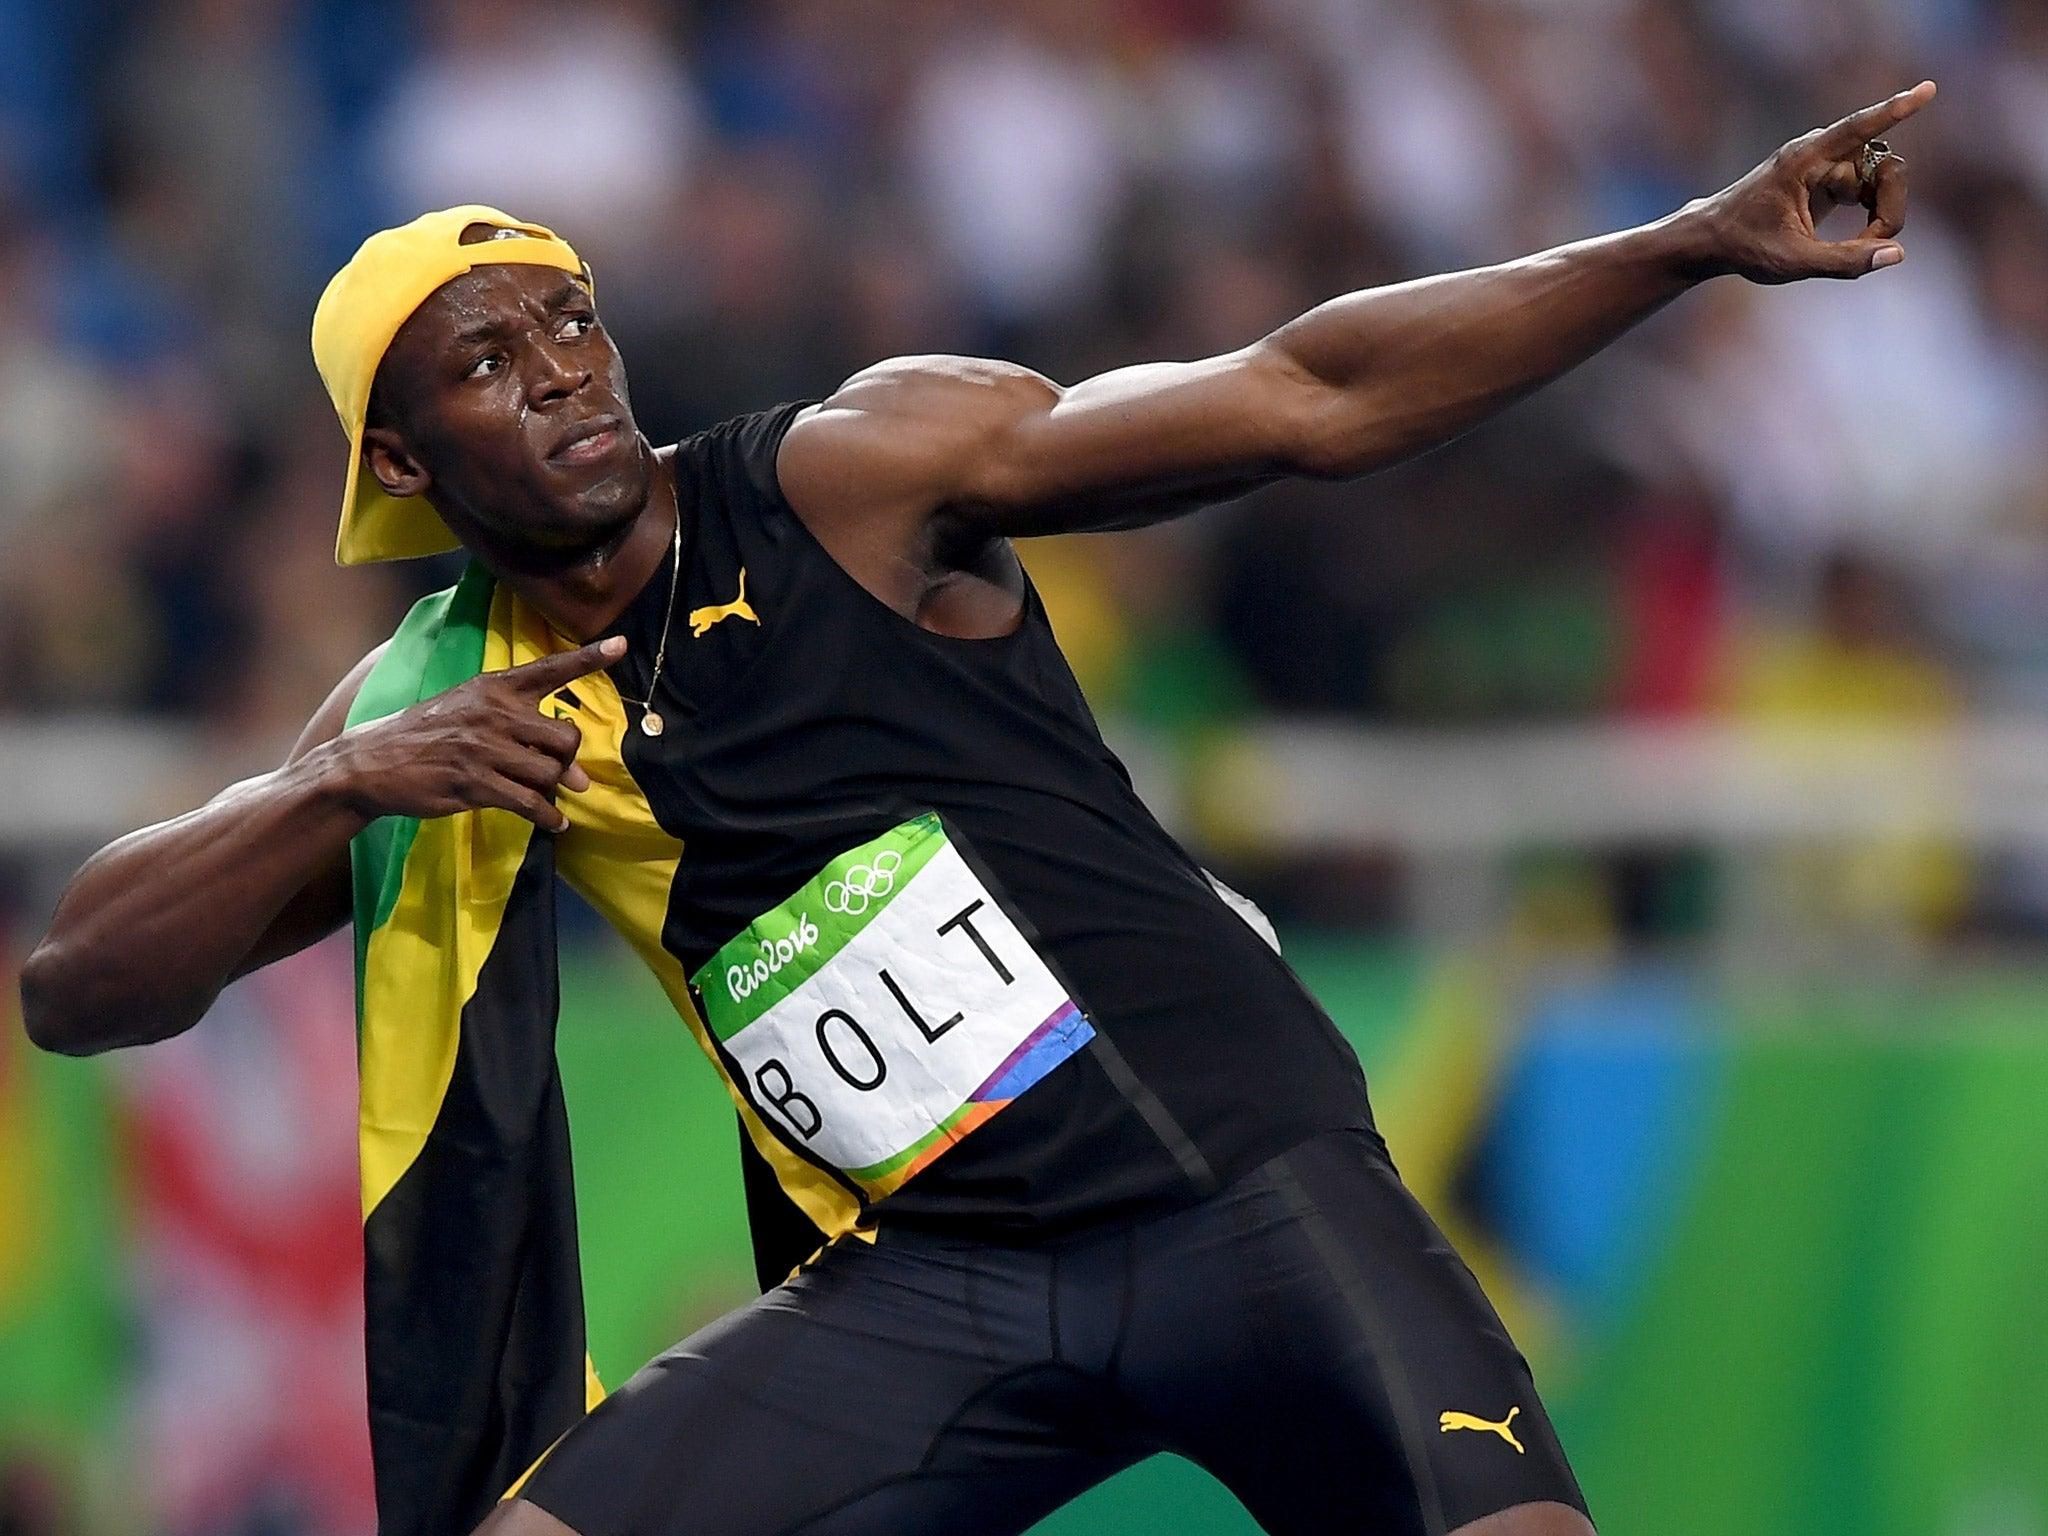 Usain Bolt Celebrates Winning The 100m Olympic Final Getty